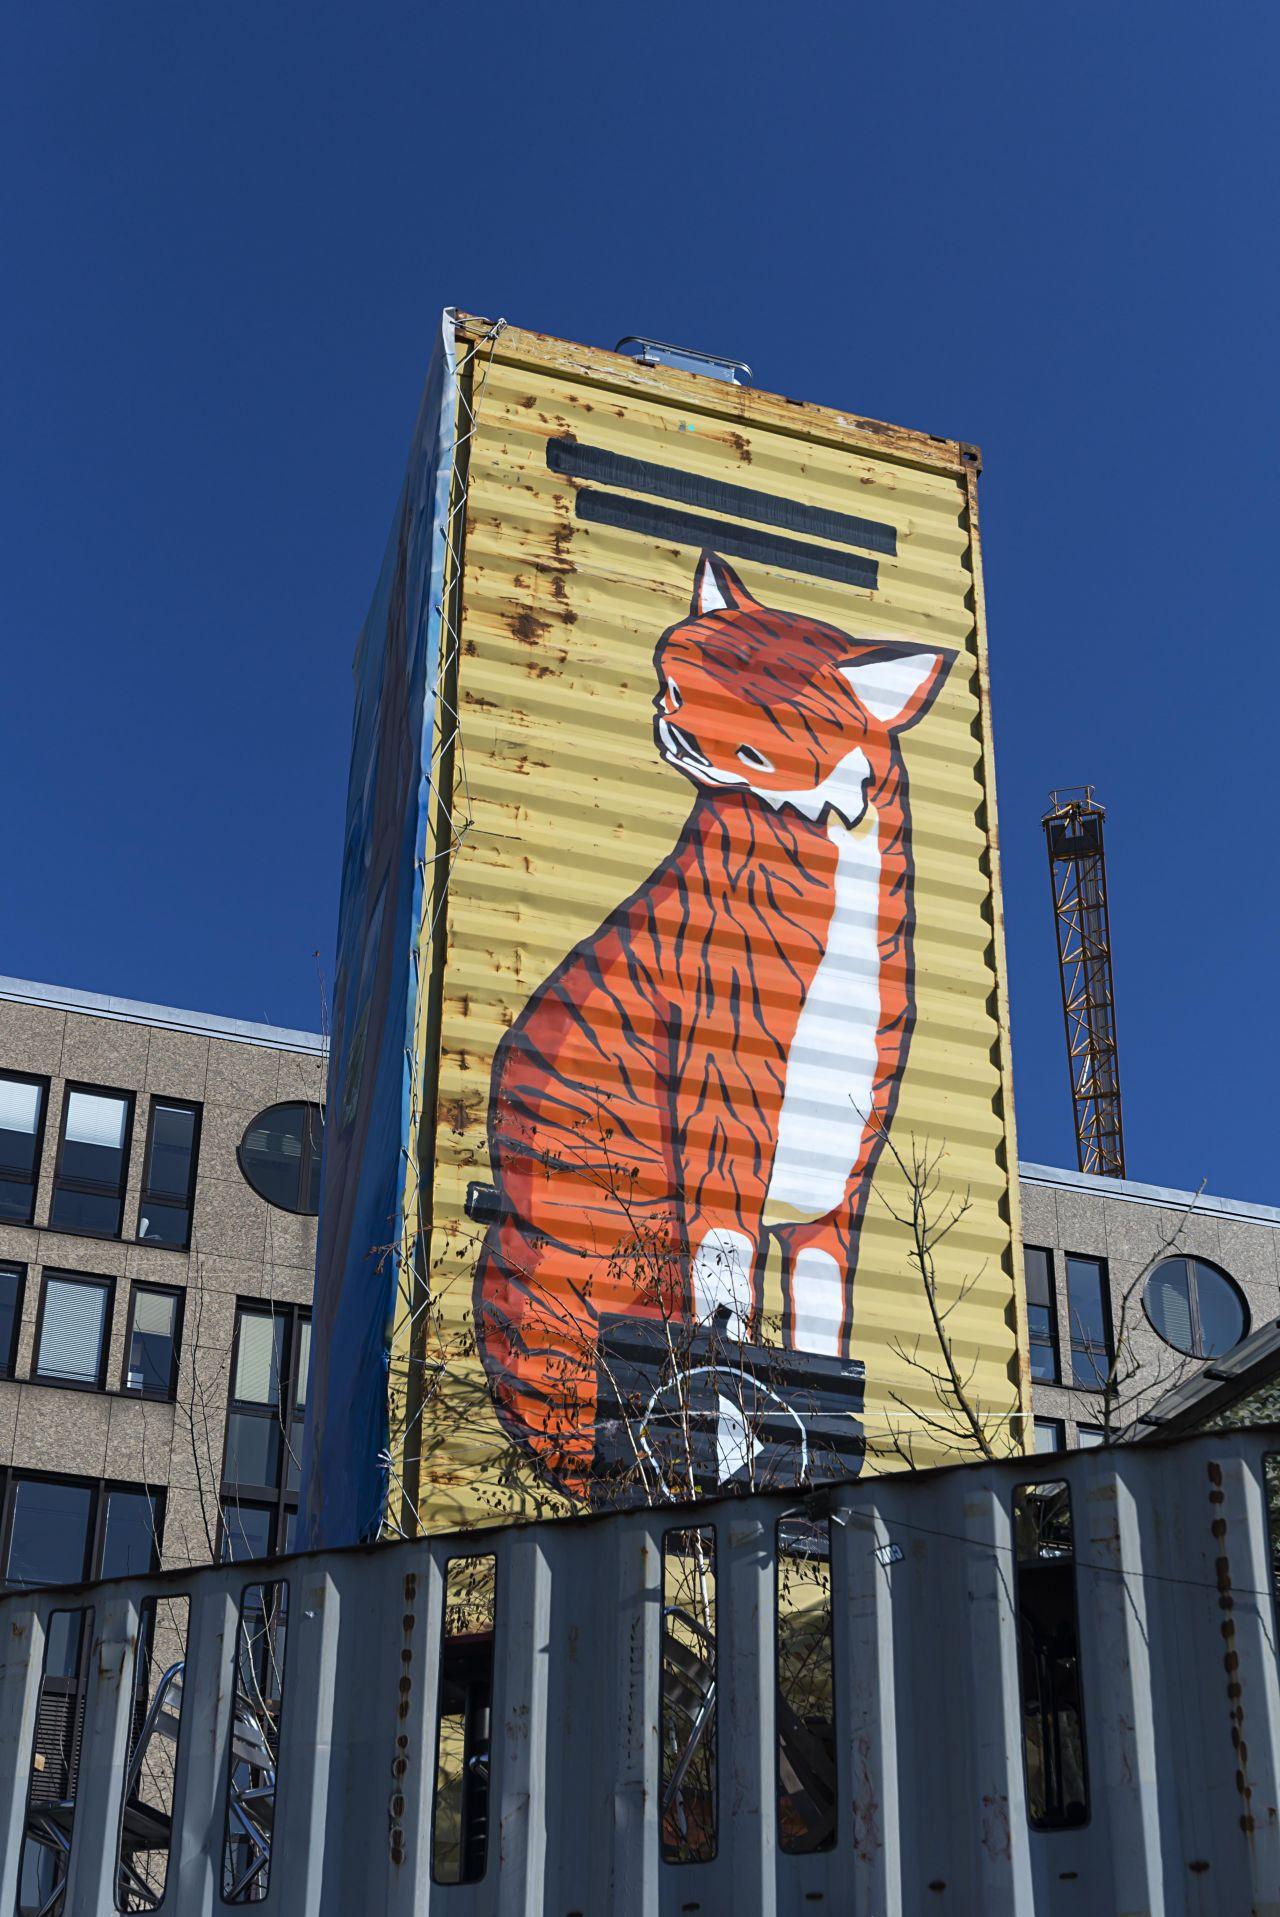 Bemalter Container in München